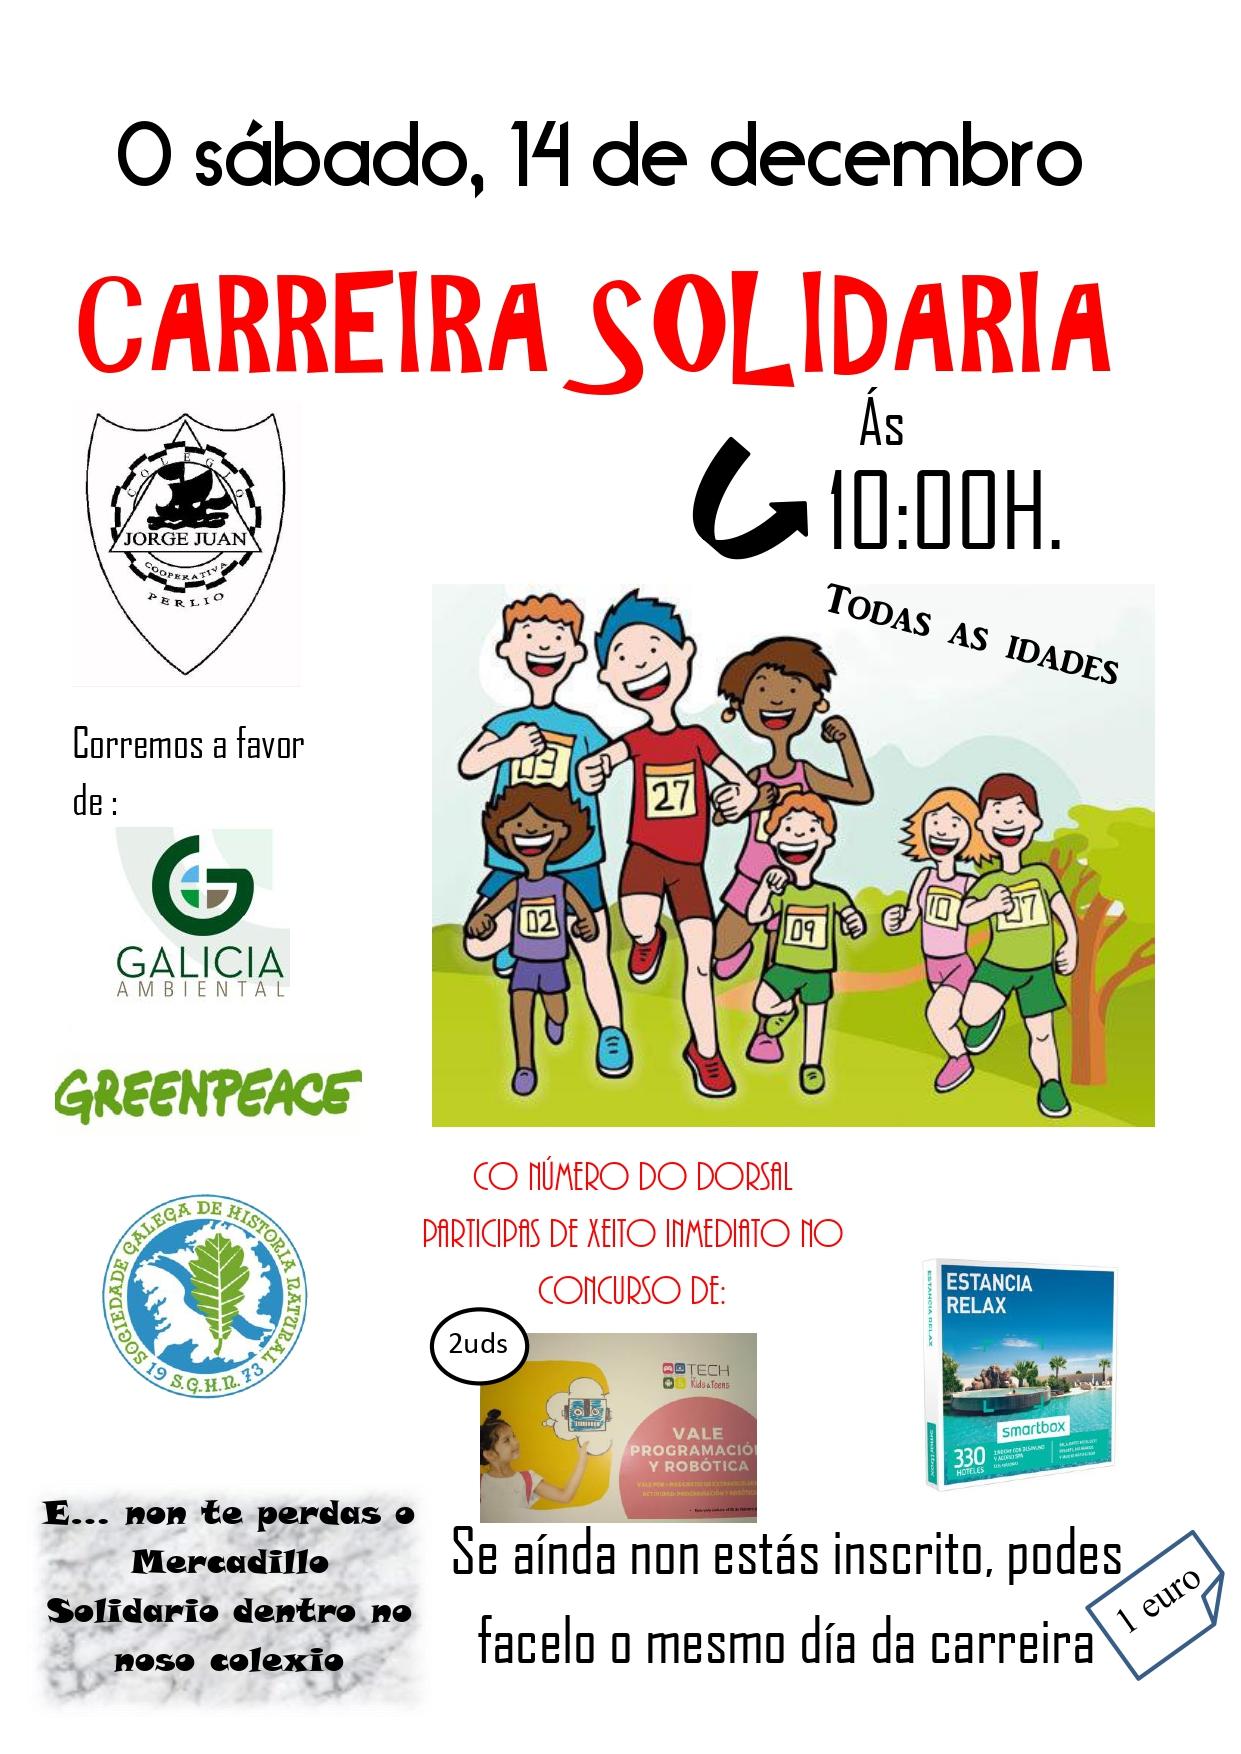 Carreira Solidaria